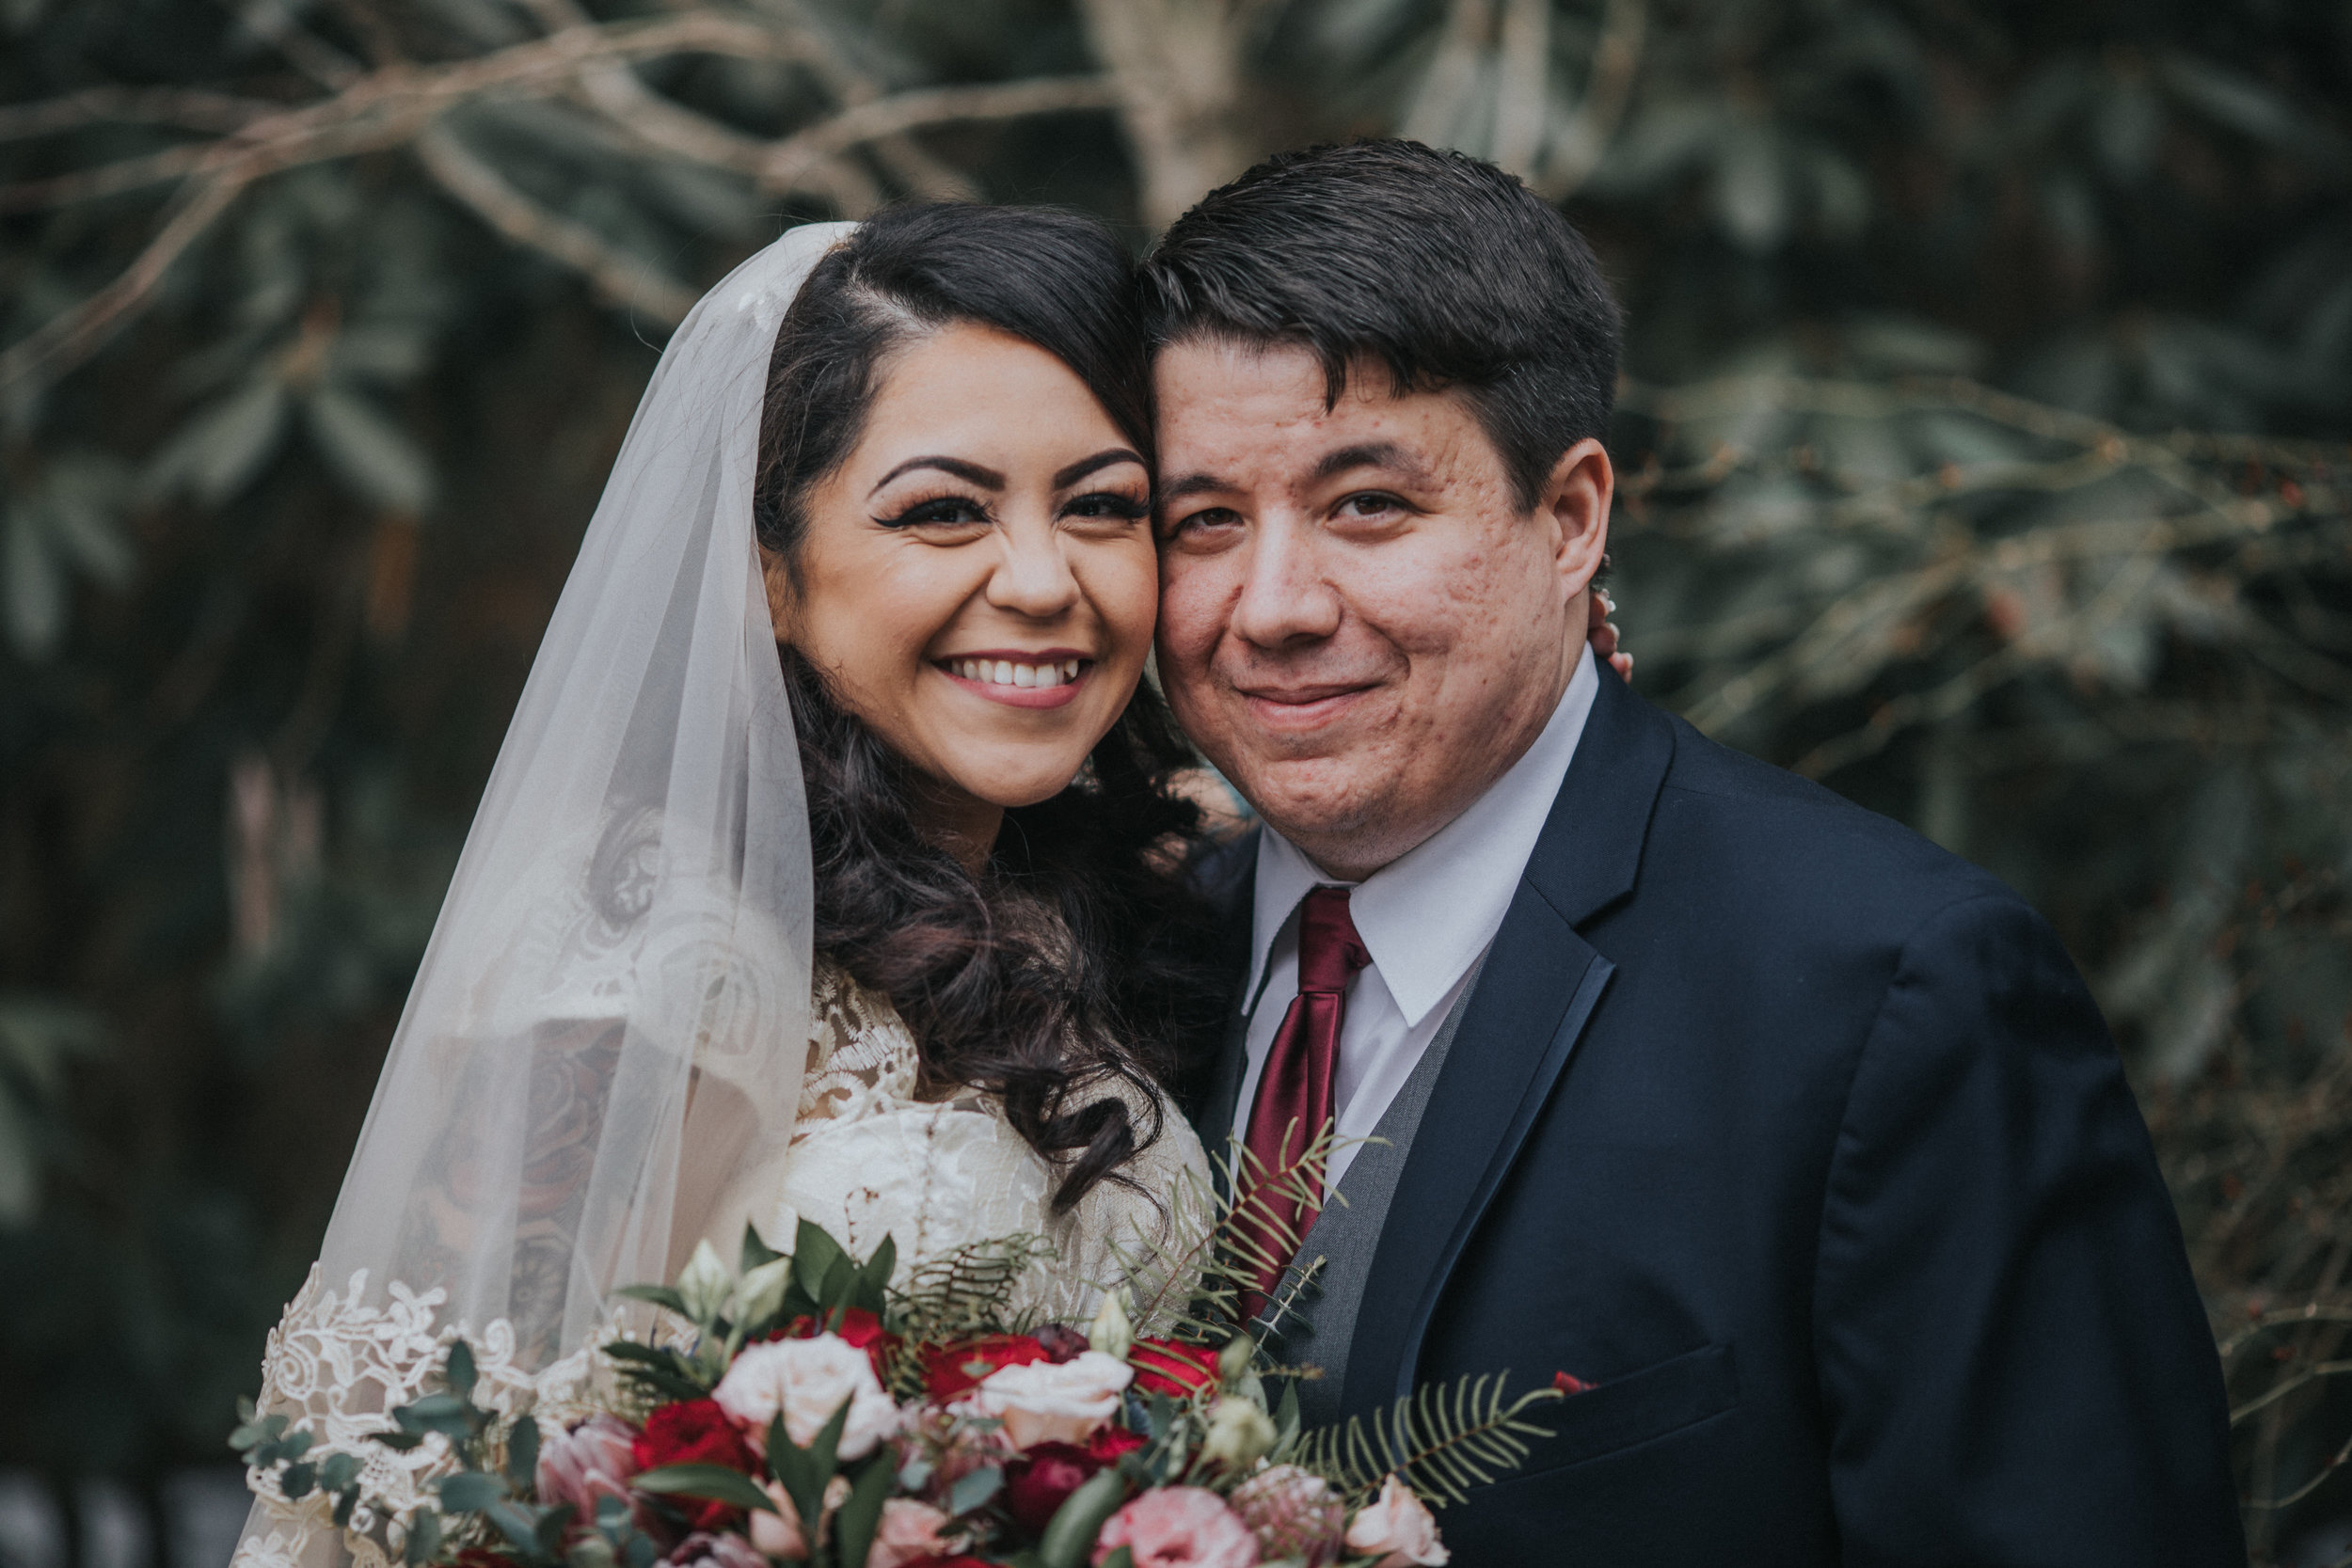 New-Jersey-Wedding-Photographer-ReceptionCenter-Valeria&Mike-First-Look-Bride&Groom (29 of 69).jpg